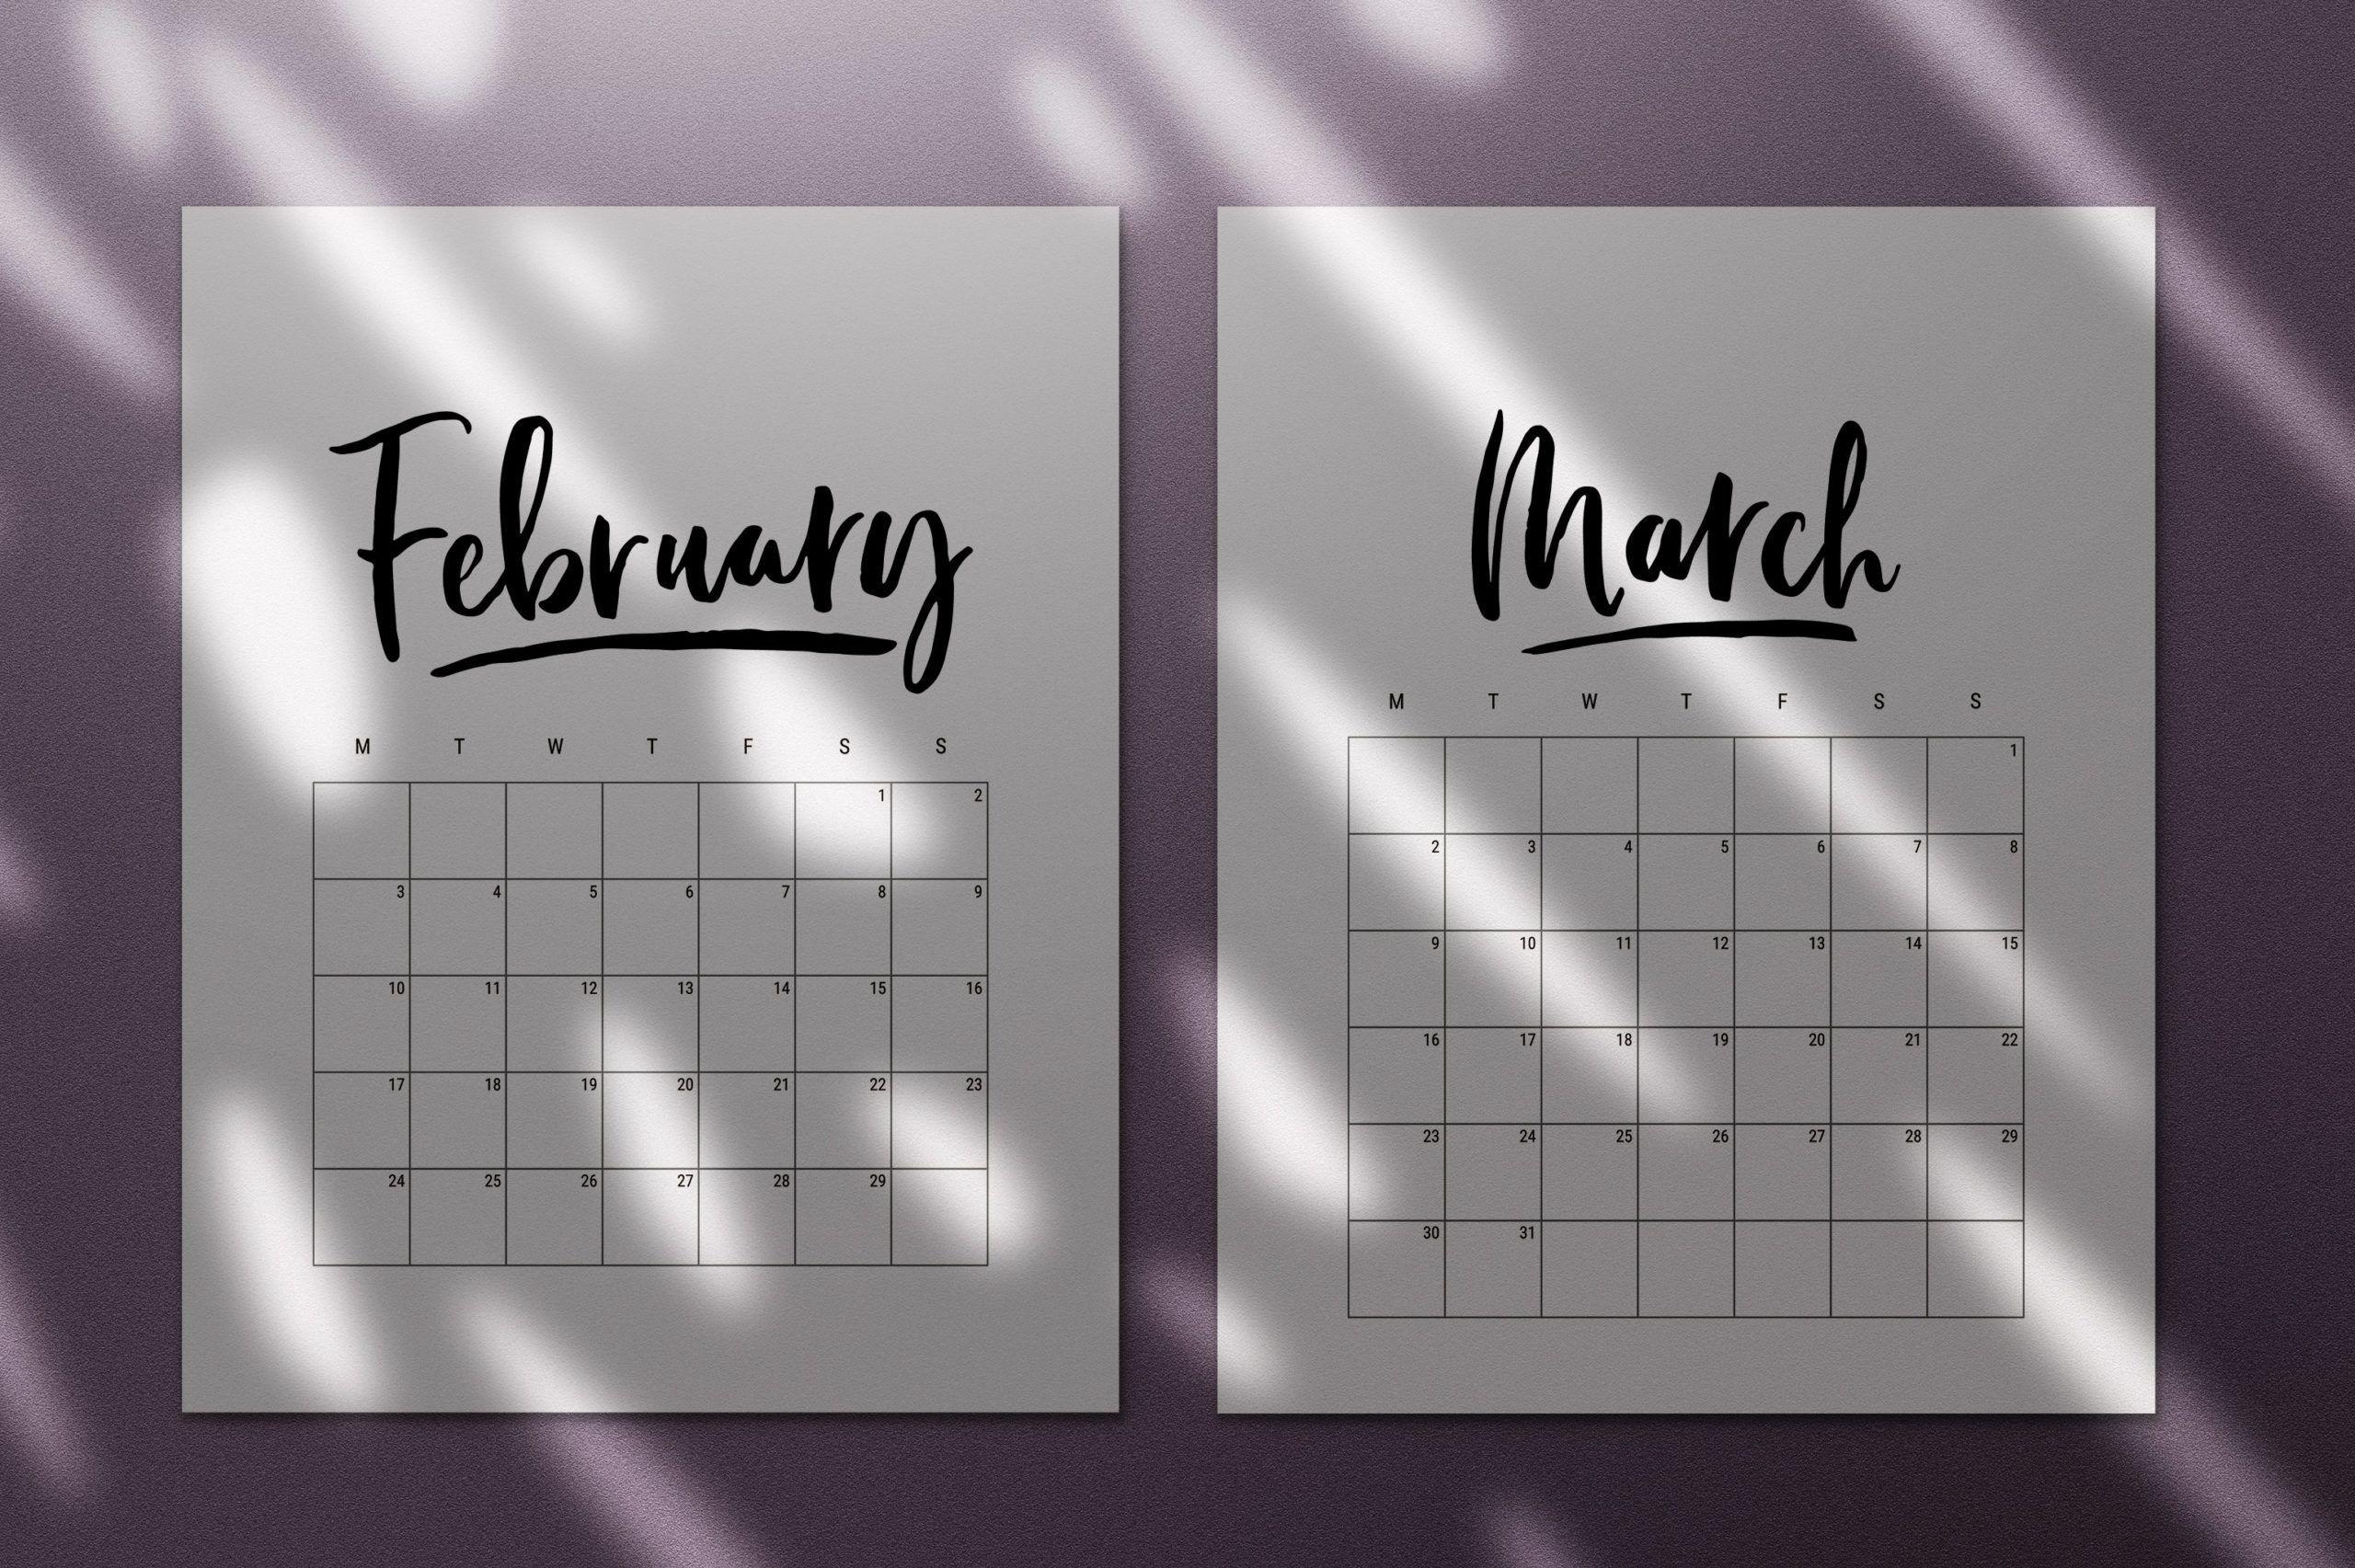 000 Breathtaking 2020 Calendar Template Indesign Image  Adobe FreeFull